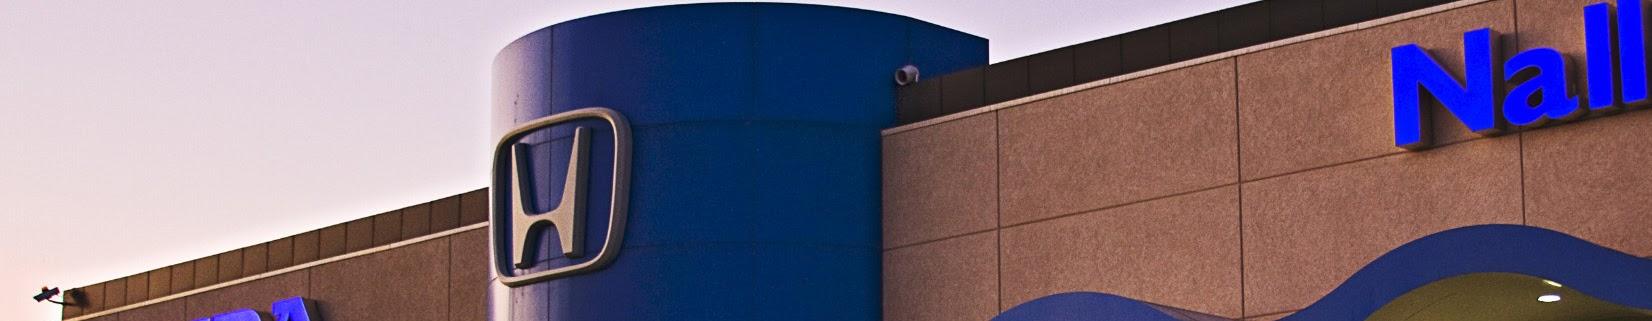 nalley honda at 4197 jonesboro road union city ga on fave. Black Bedroom Furniture Sets. Home Design Ideas